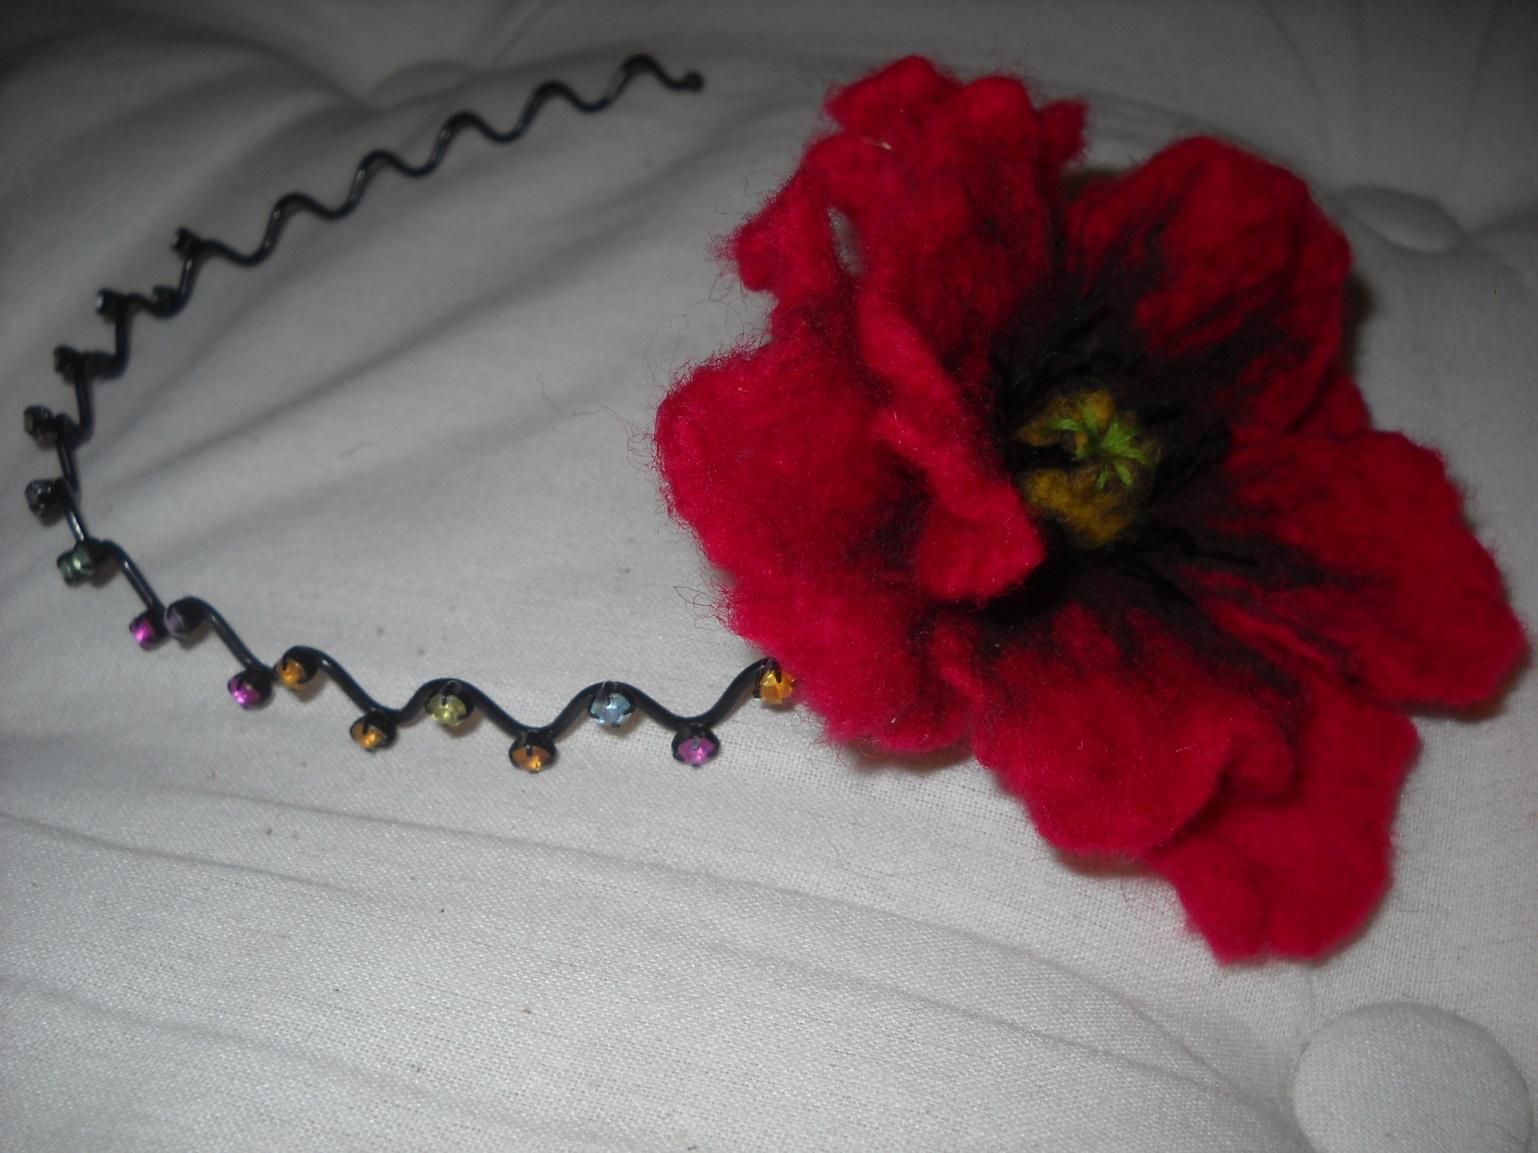 E:\2010-11-16 Алла фото\Мое рукоделие\2012-03-27 изделия из шерсти\DSCN2259.JPG